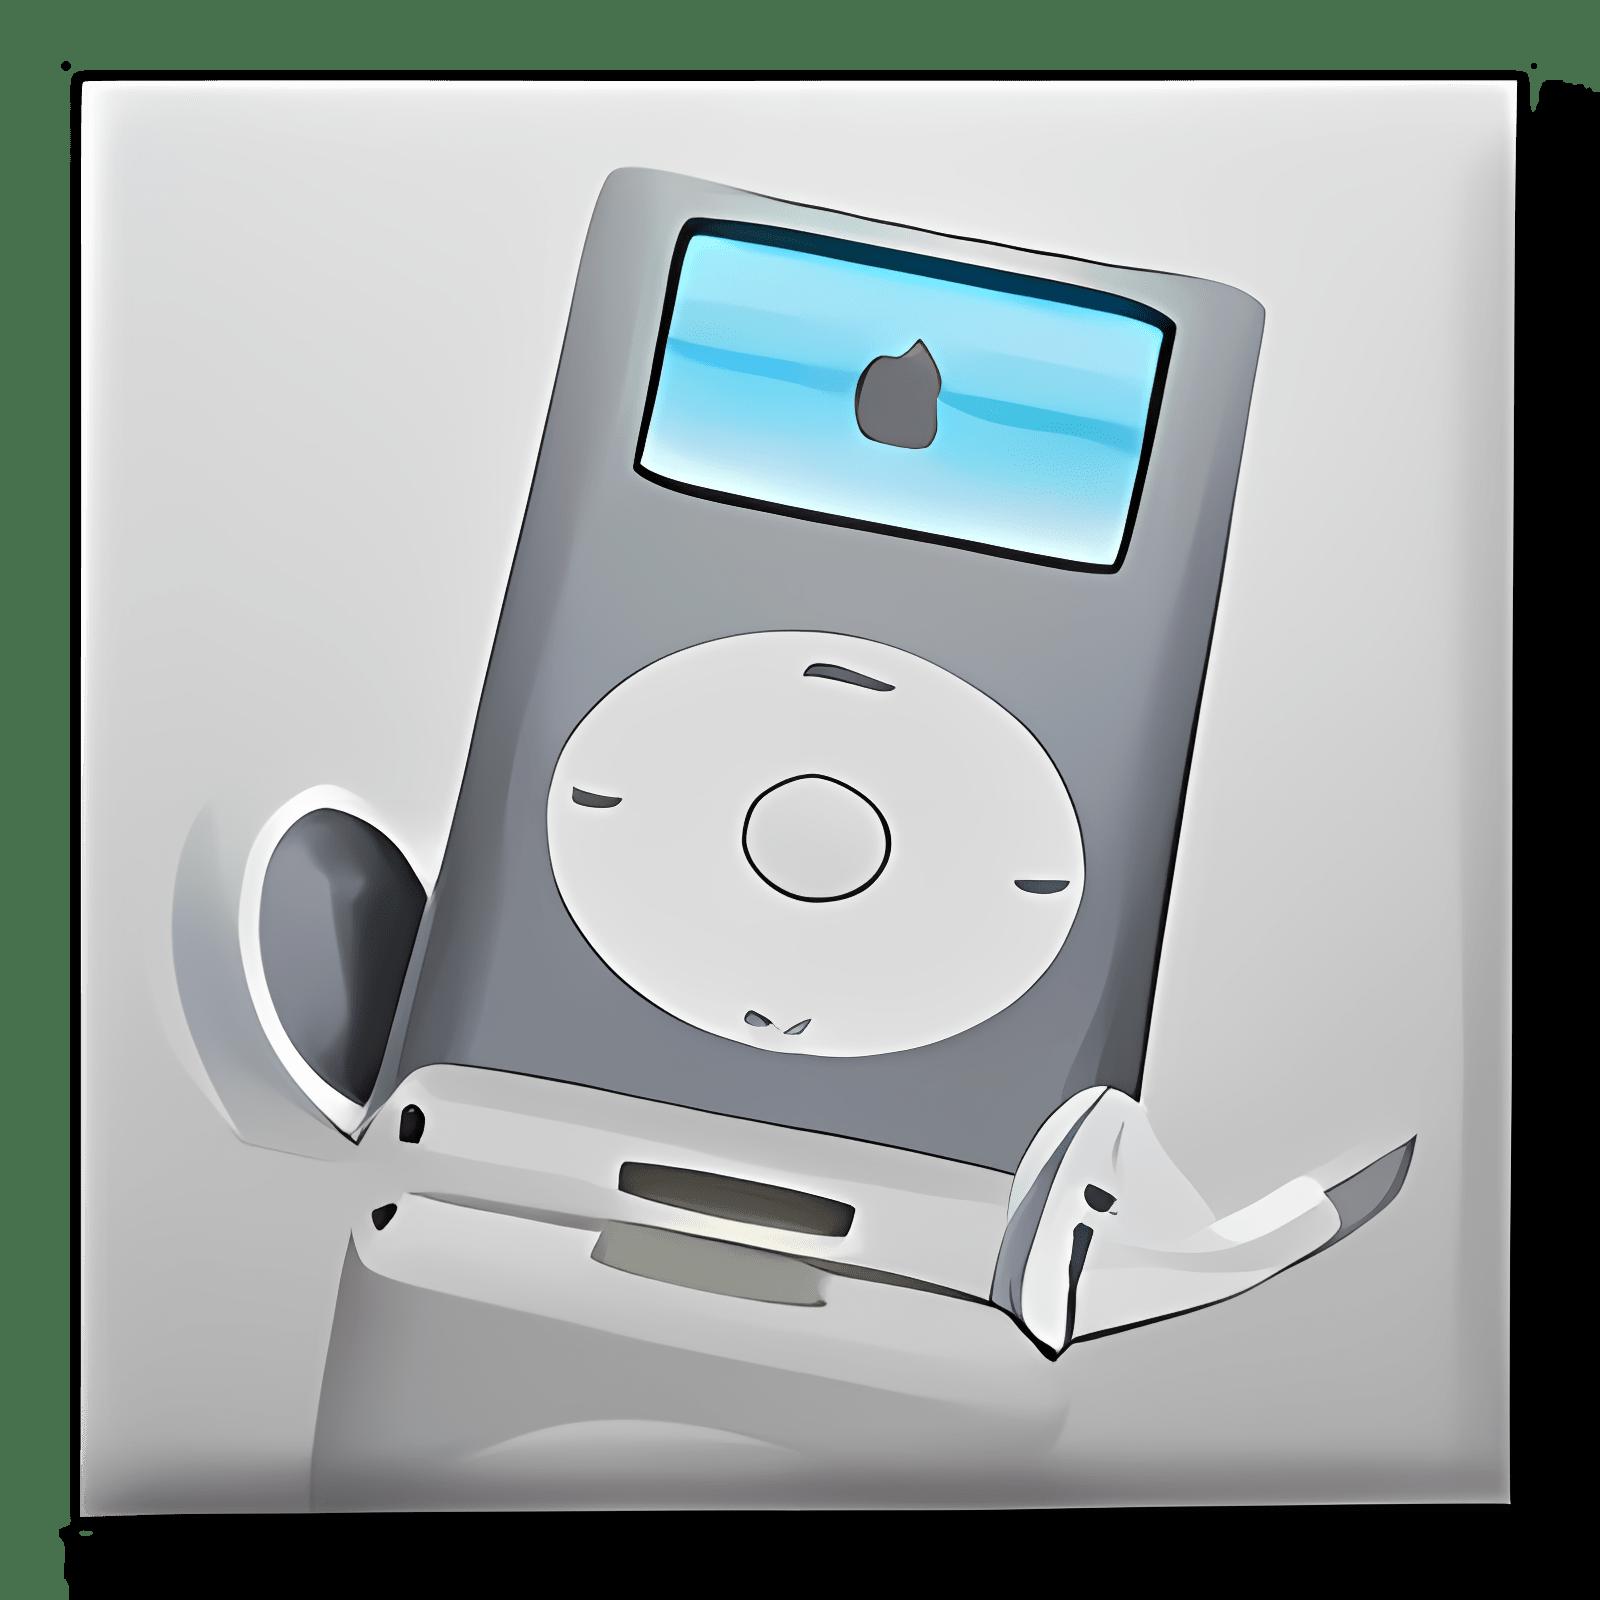 WinX AVI to iPod Video Converter